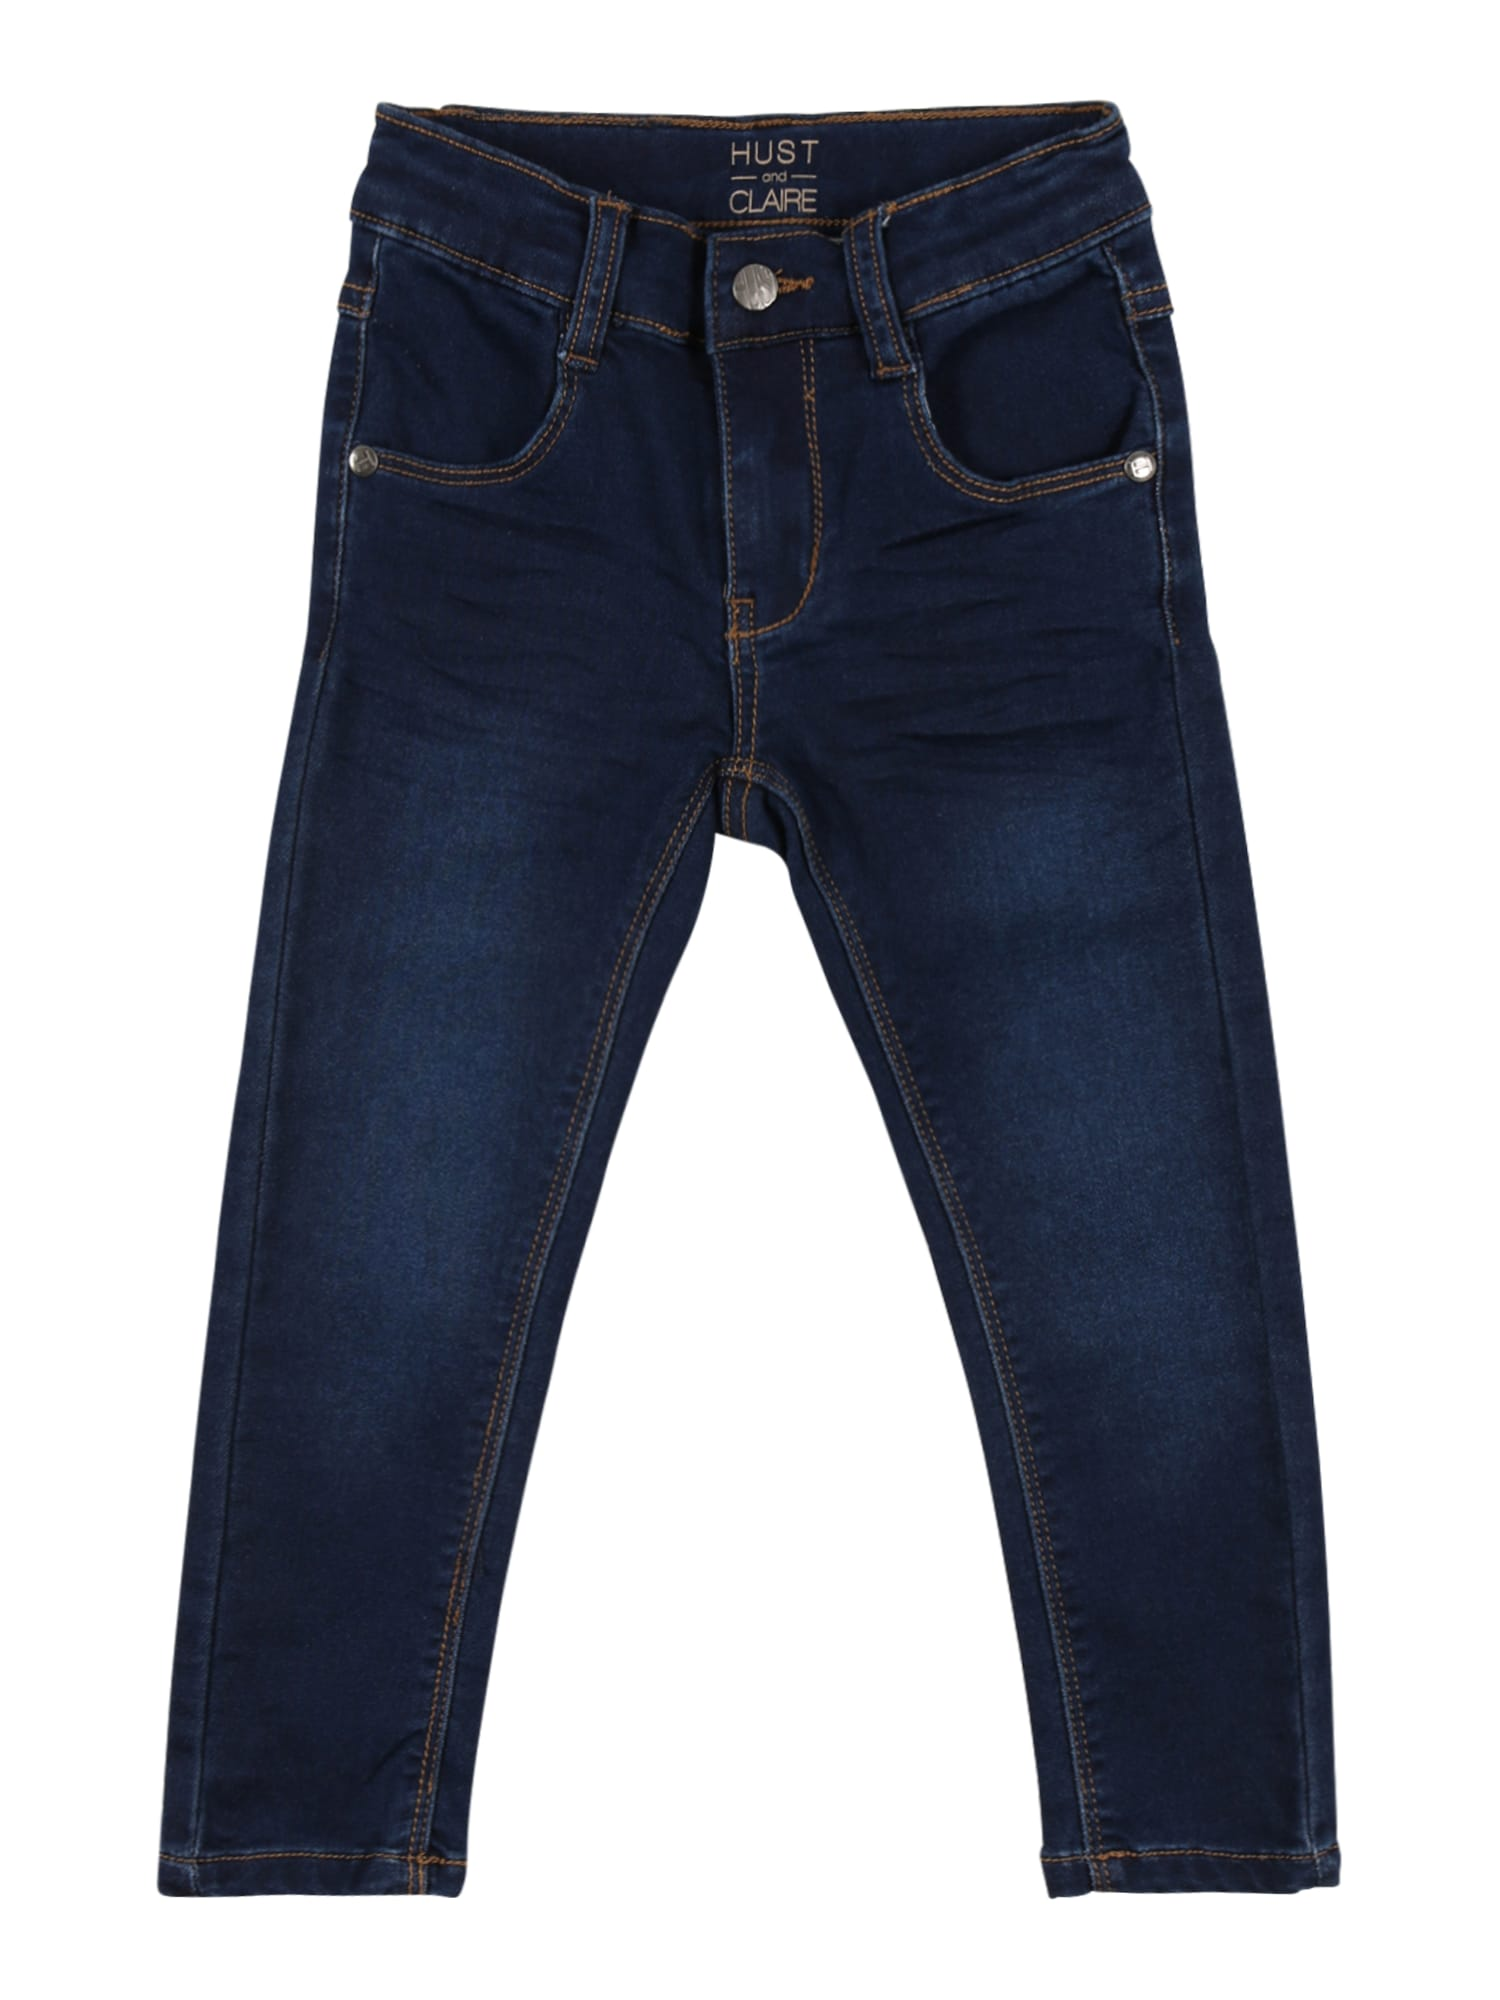 Hust & Claire Džinsai tamsiai (džinso) mėlyna